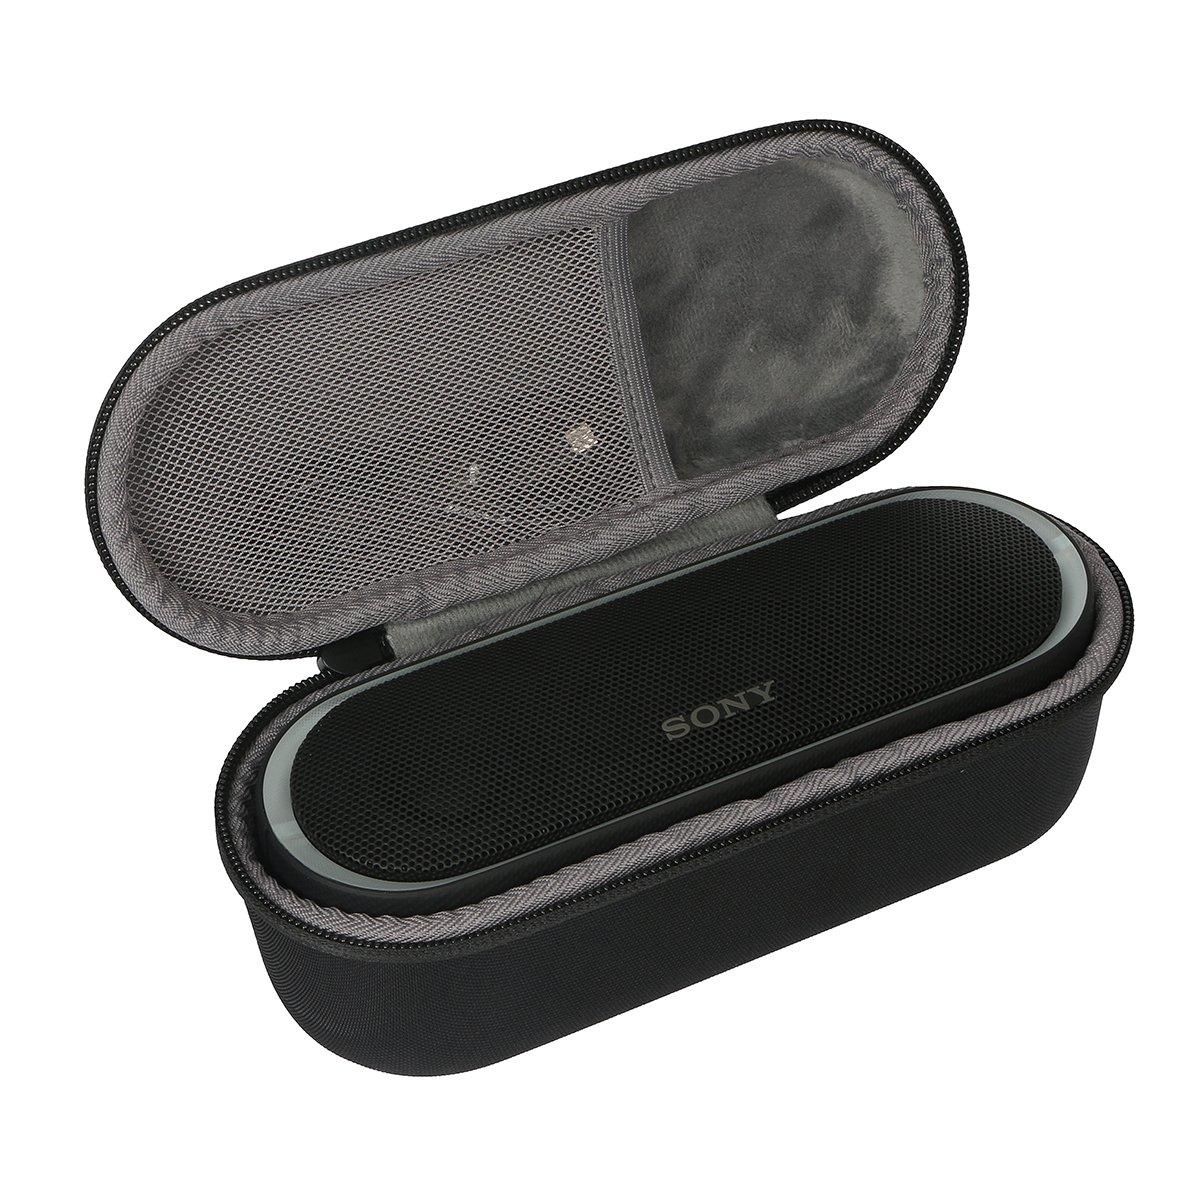 para Sony SRS XB Altavoz inalámbrico portátil Almacenamiento Estuche de transporte paquete